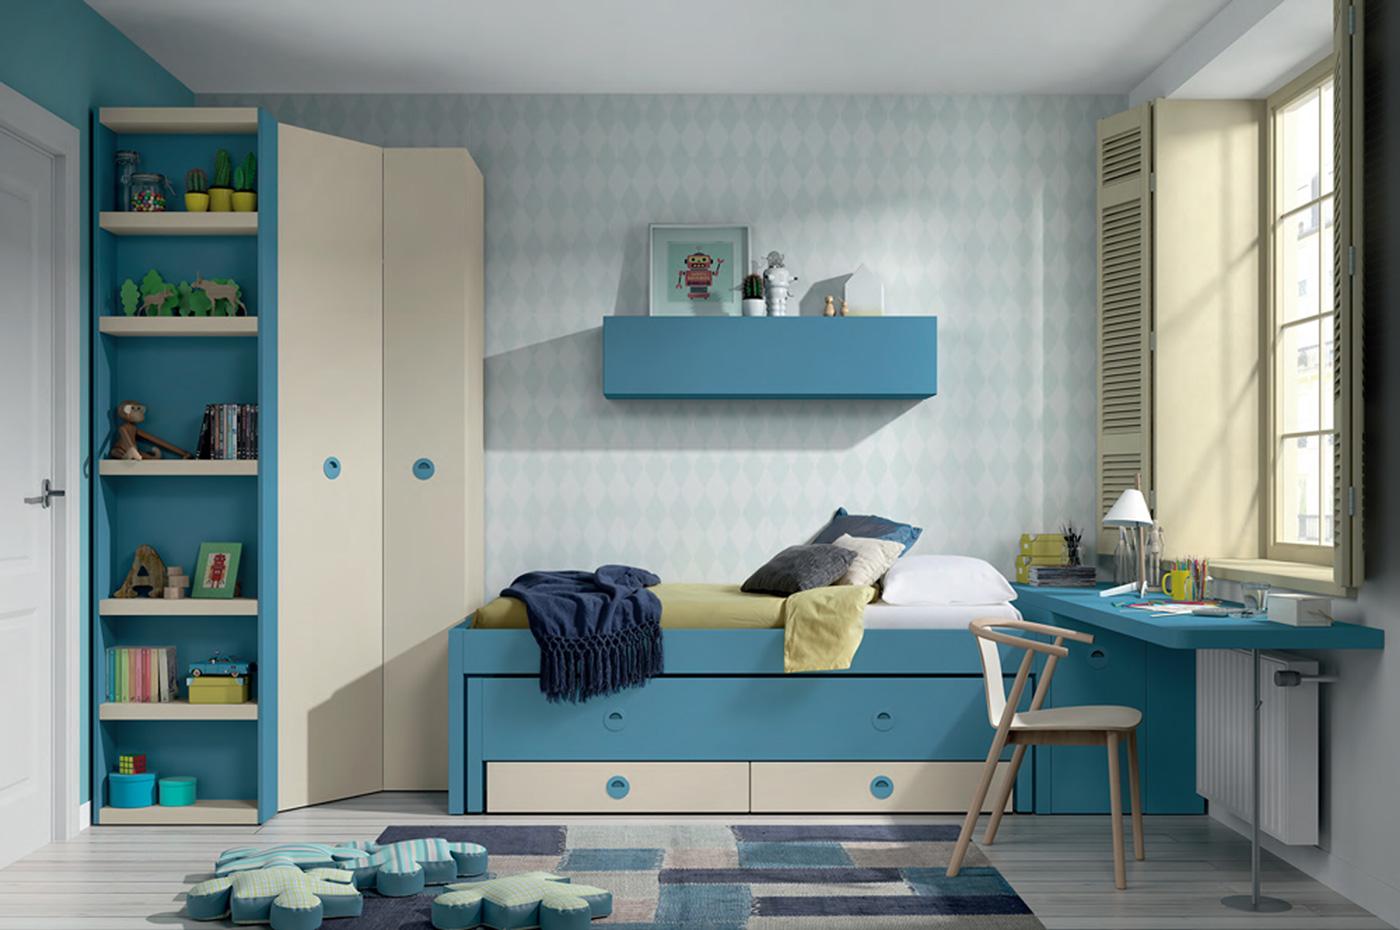 Dormitorio Juvenil Teleno. Dormitorio Juvenil con Armario de Rincón Muebles Díaz